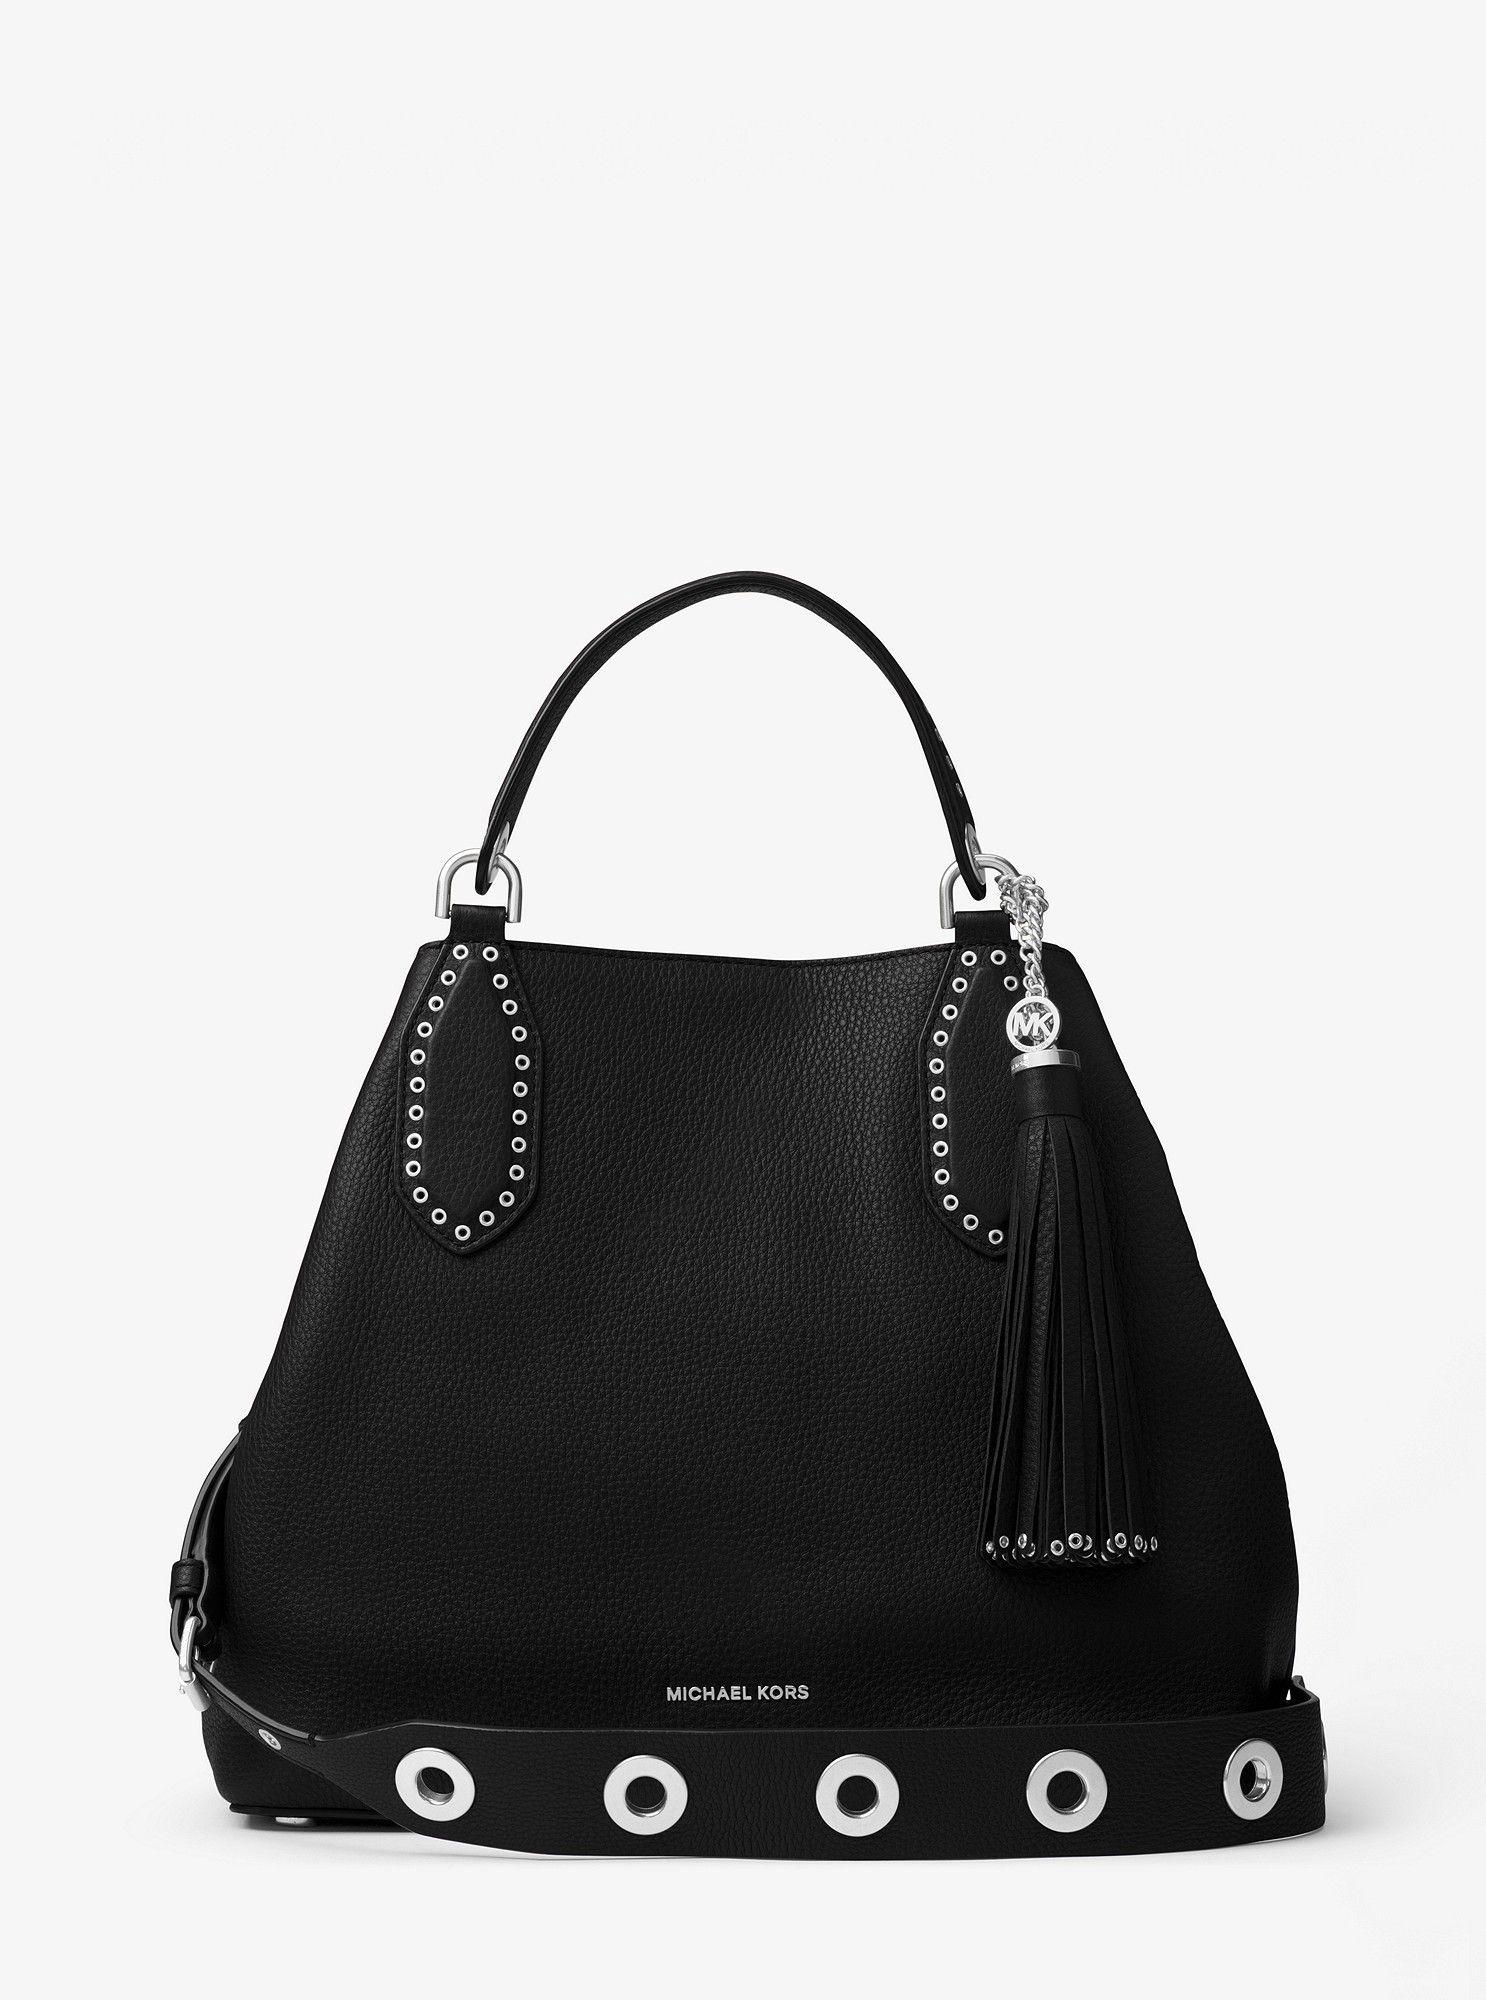 Michael Kors Brooklyn Large Leather Satchel - Black  8e62bef3015e0